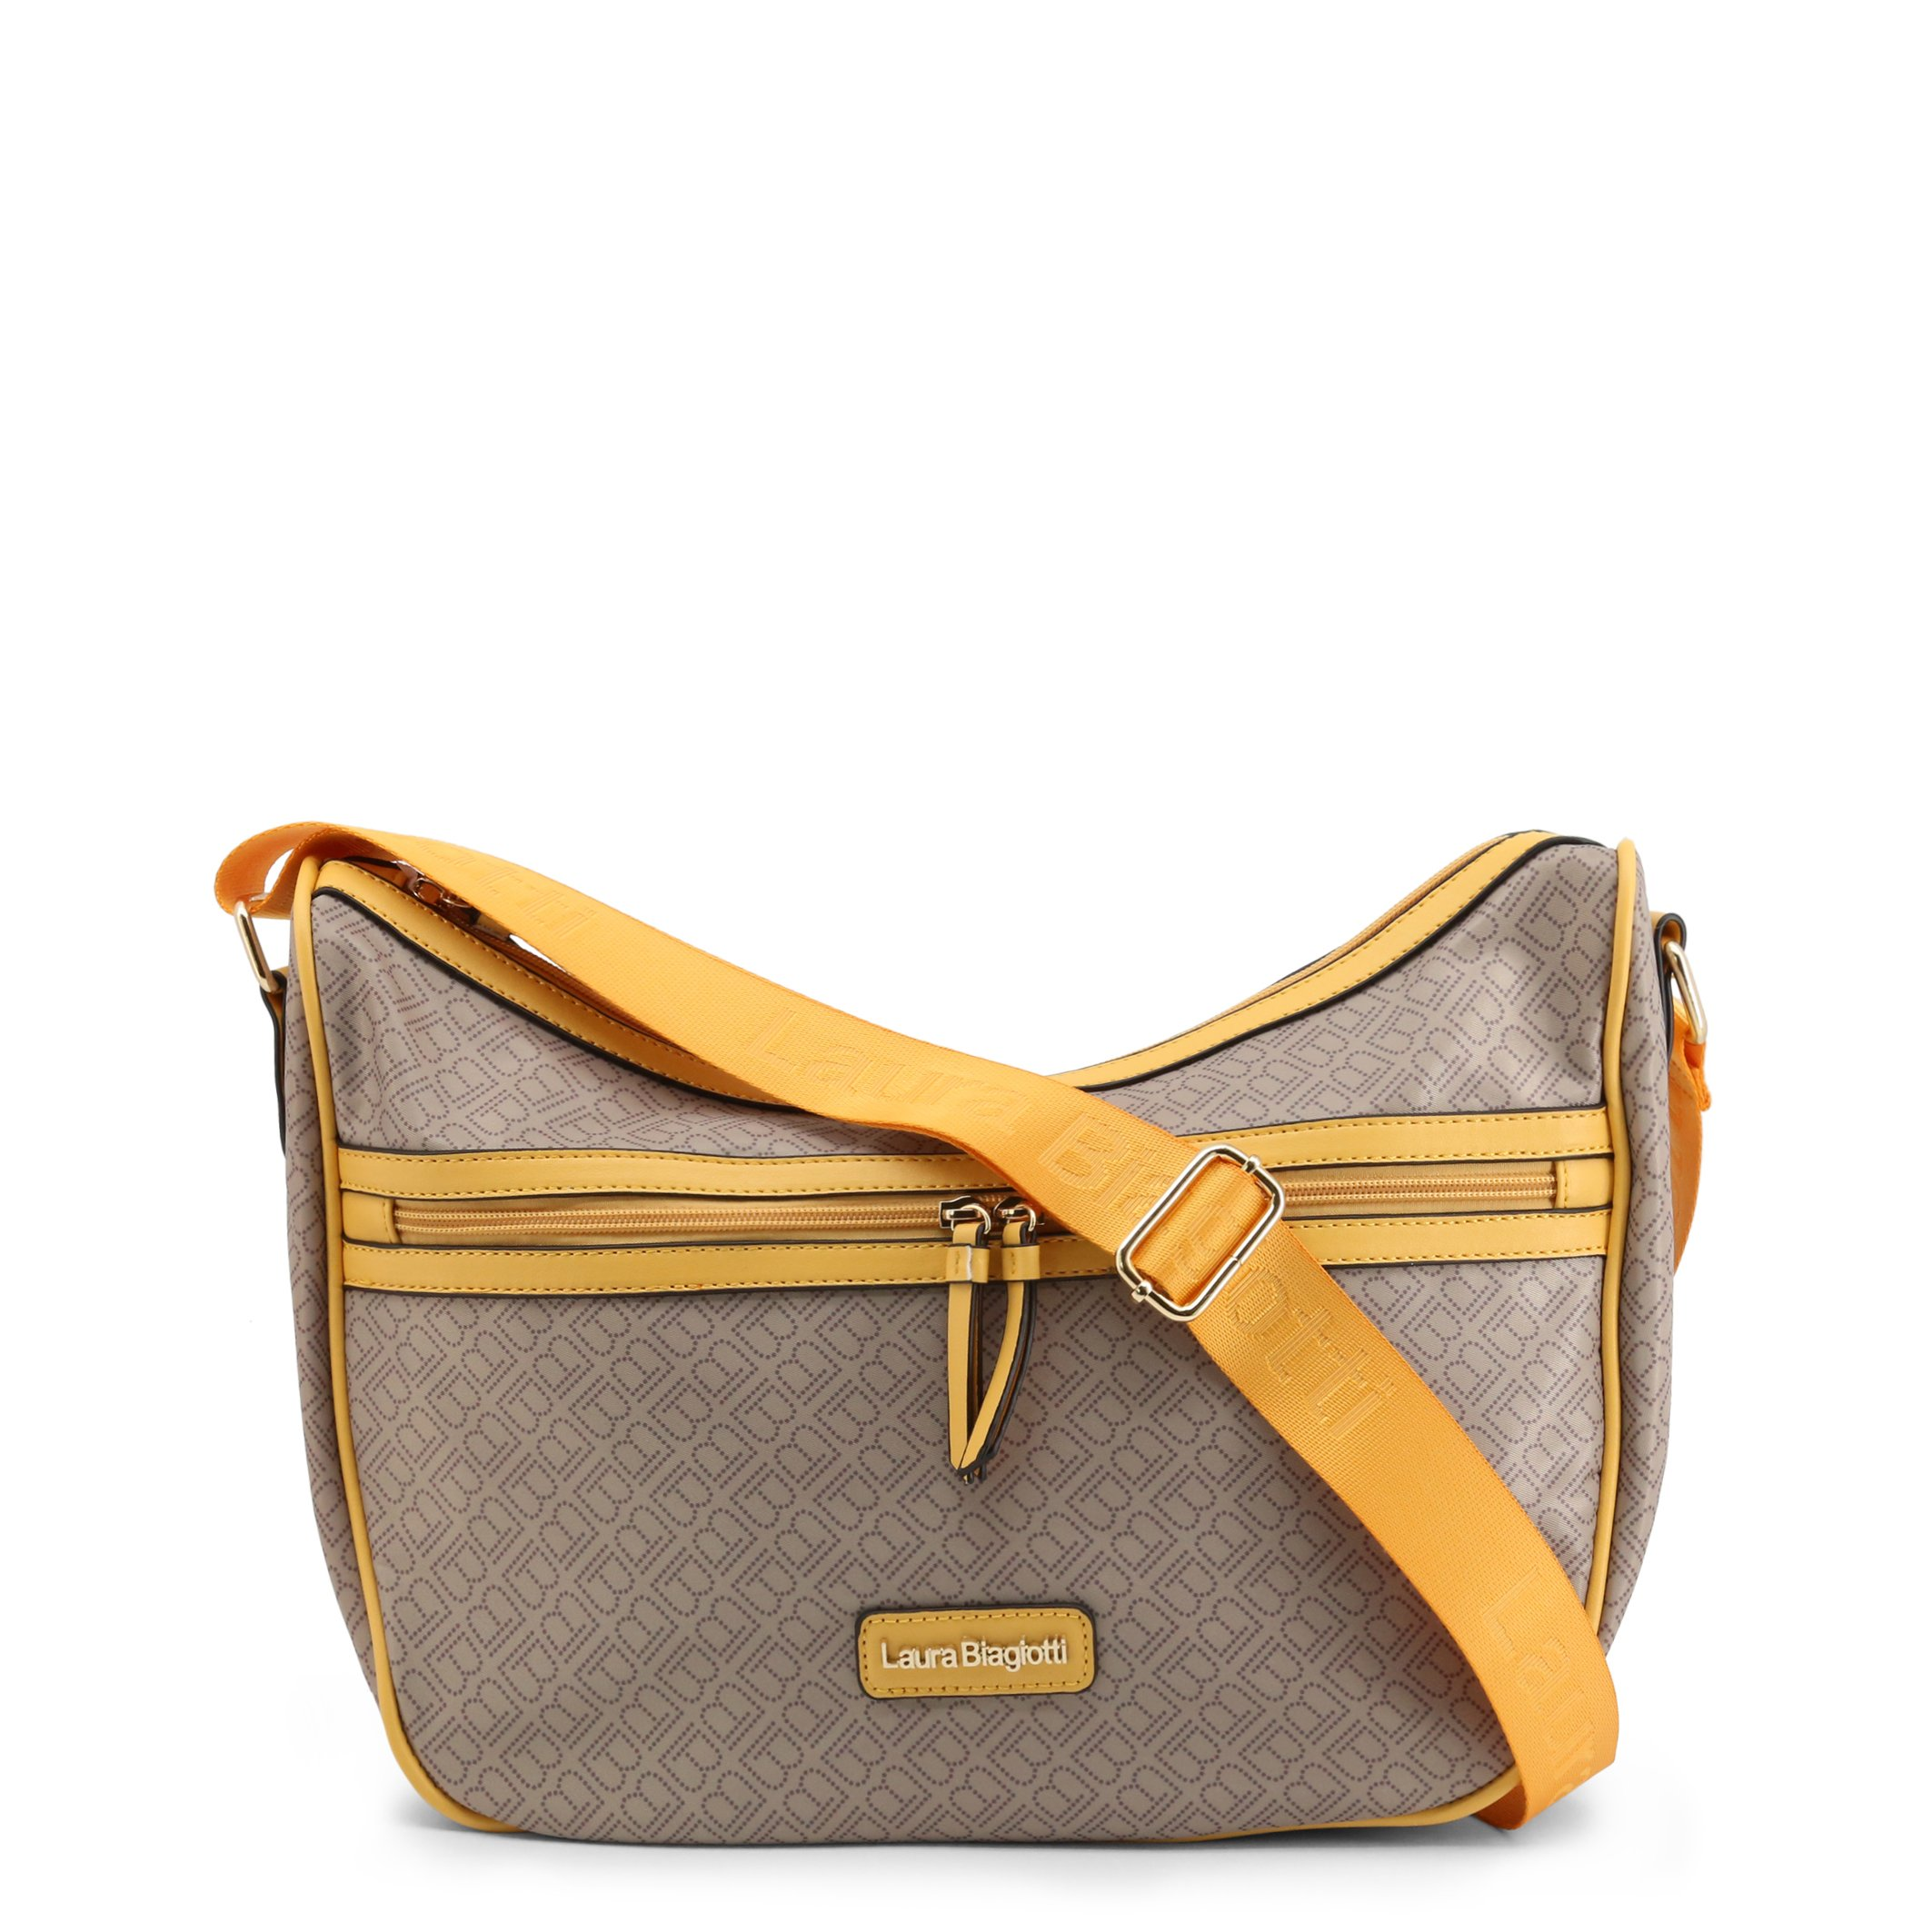 Laura Biagiotti Women's Crossbody Bag Brown Thia-105-11 - brown-1 NOSIZE